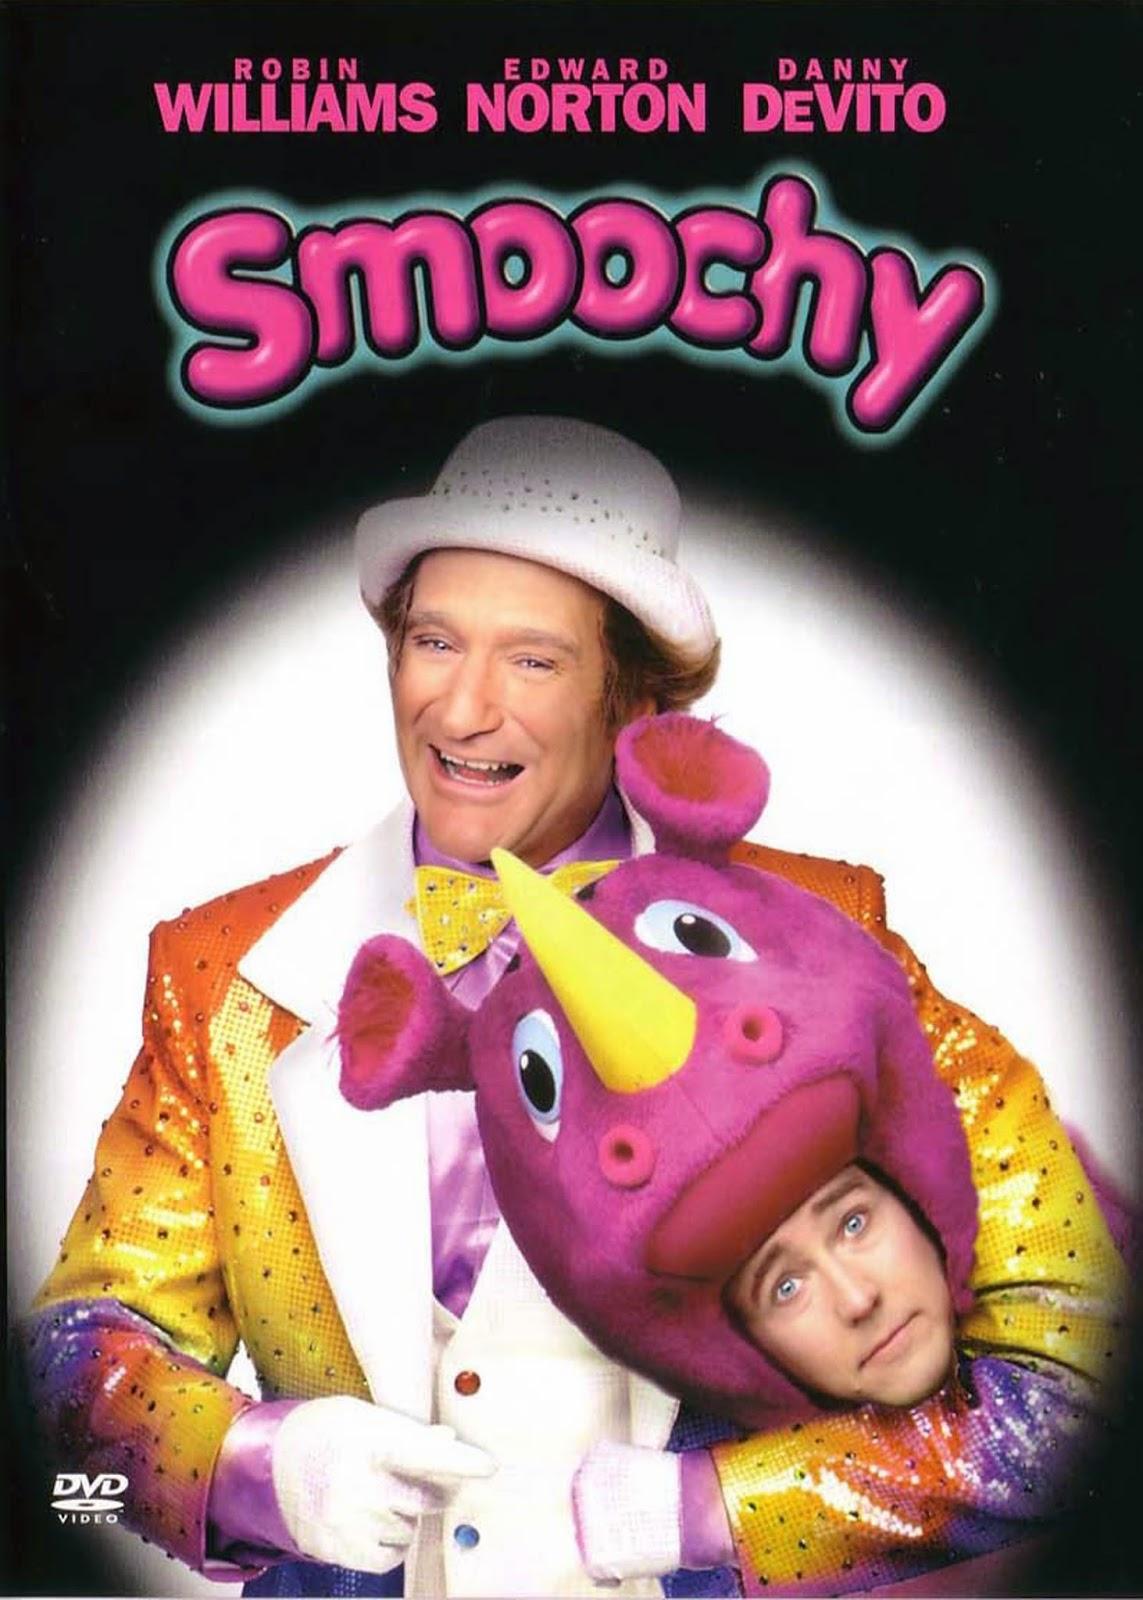 Smoochy (2002)